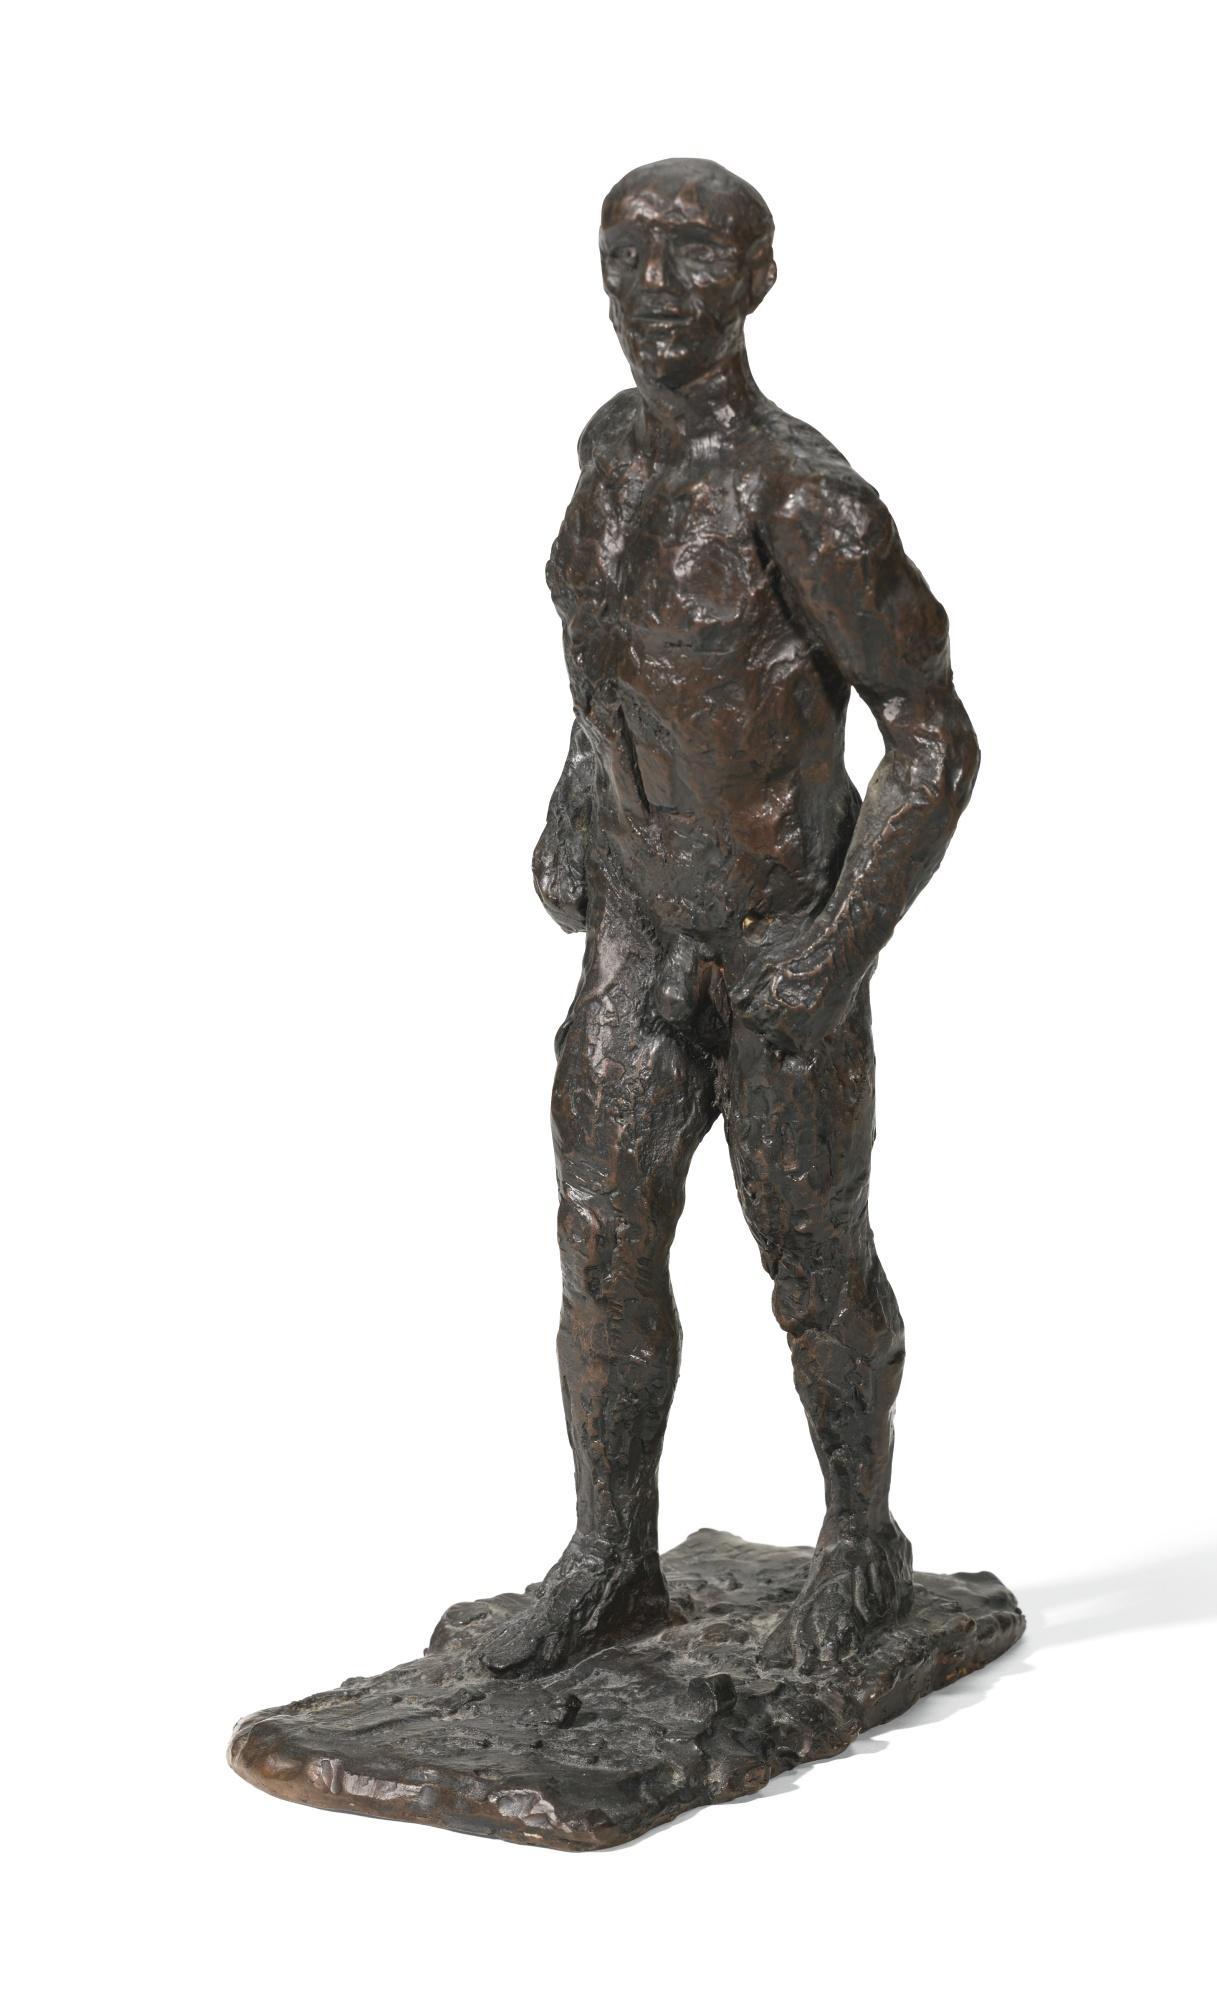 Elisabeth Frink-Small Male Figure-1986